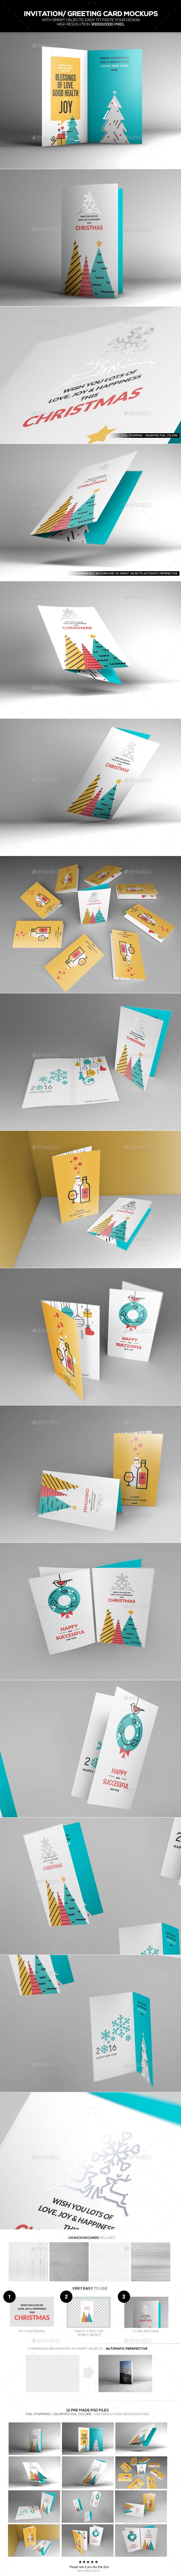 Invitation/ Greeting Card Mockups